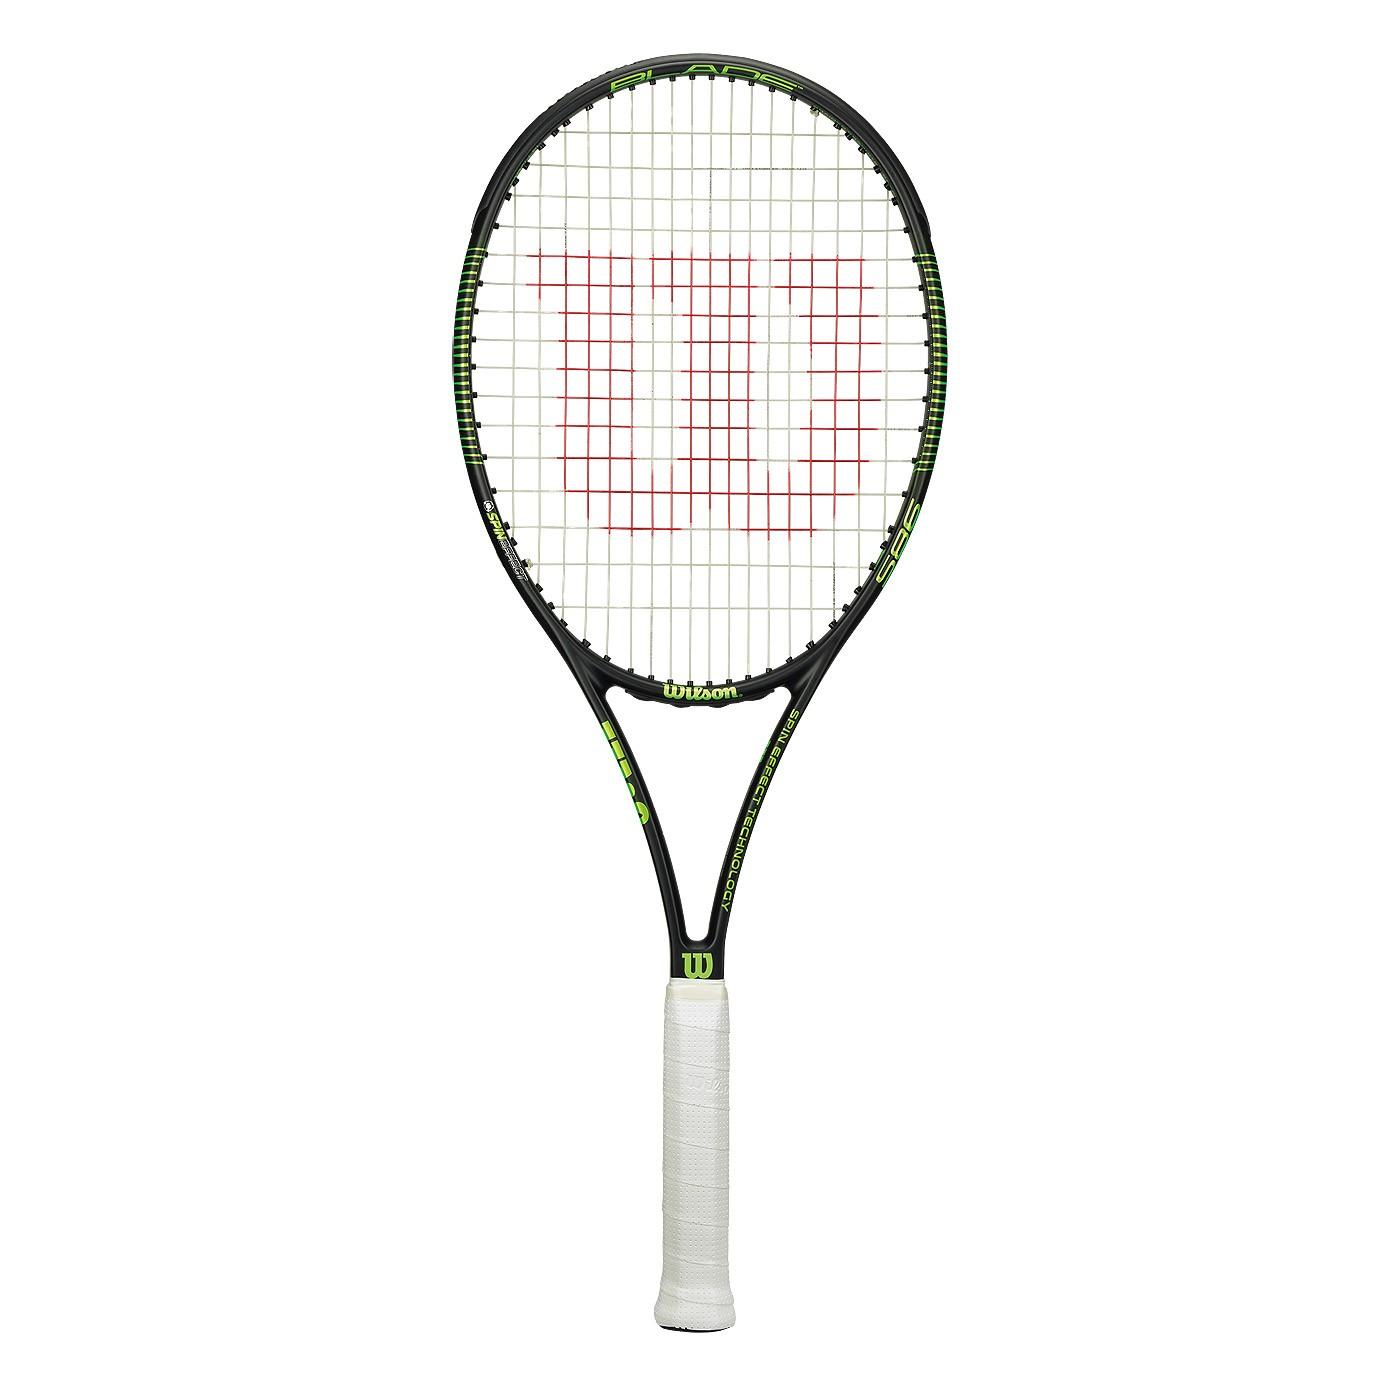 Rakieta tenisowa Wilson Blade 98S - Spin Effect!